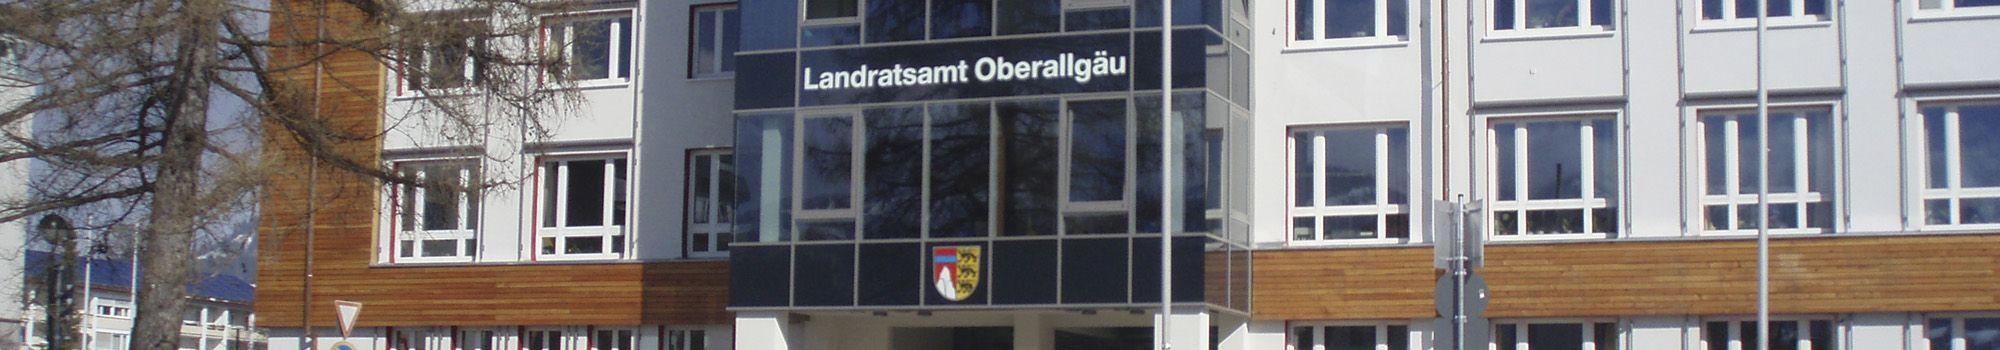 Referenzbericht Landratsamt Oberallgäu